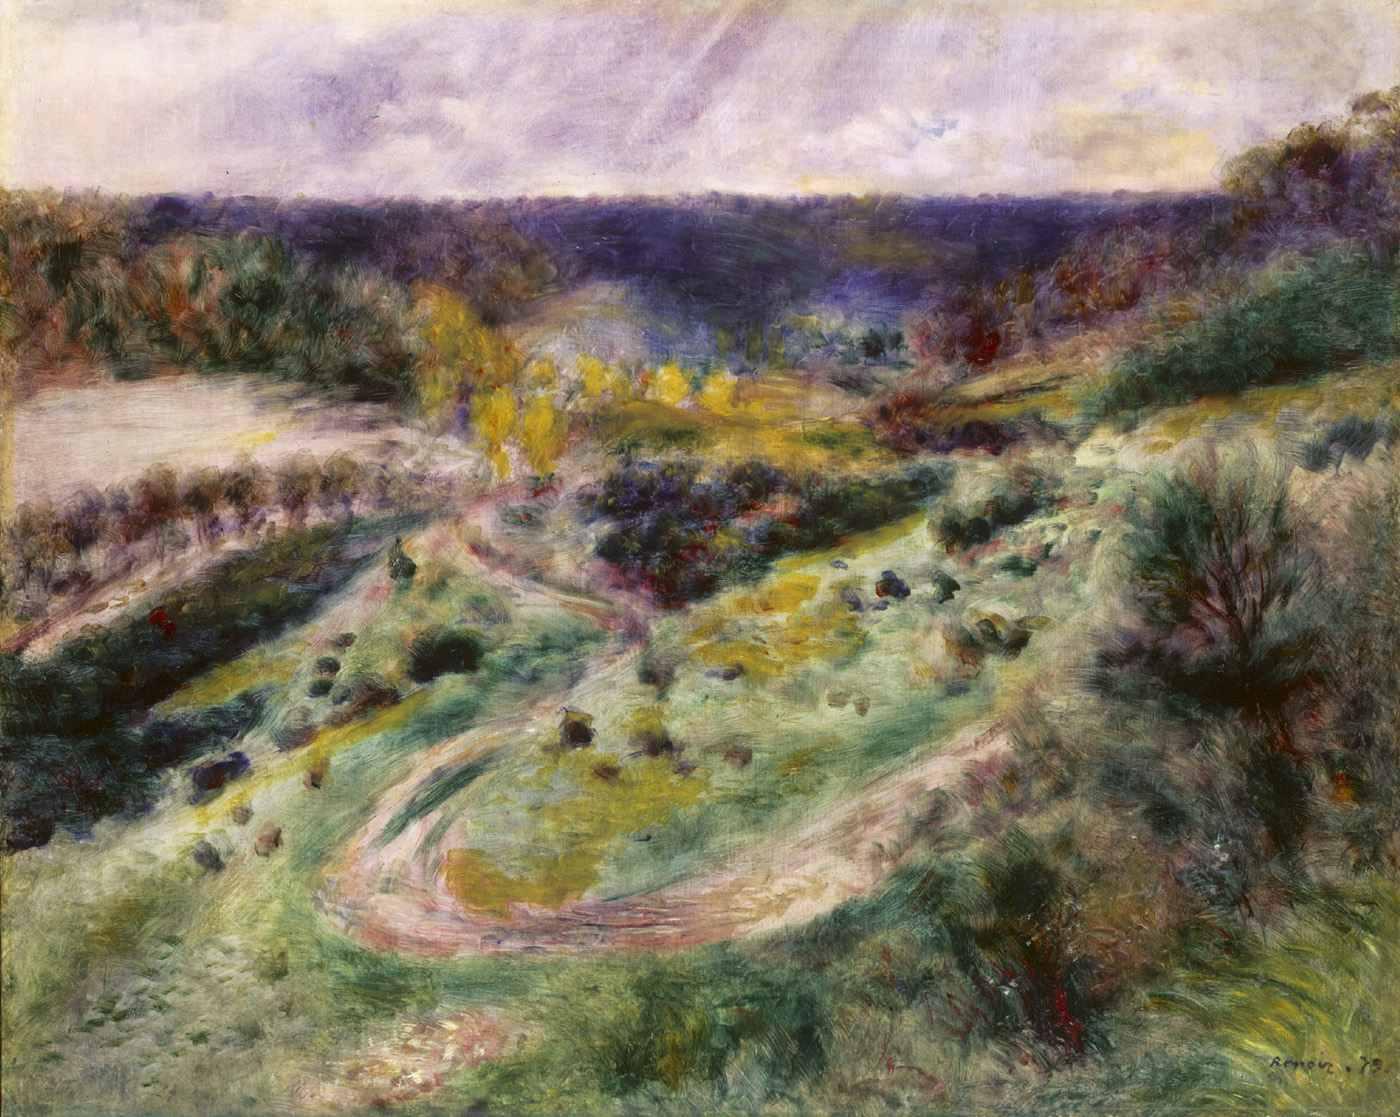 © The Toledo Museum of Art, Toledo, Ohio; used with permission